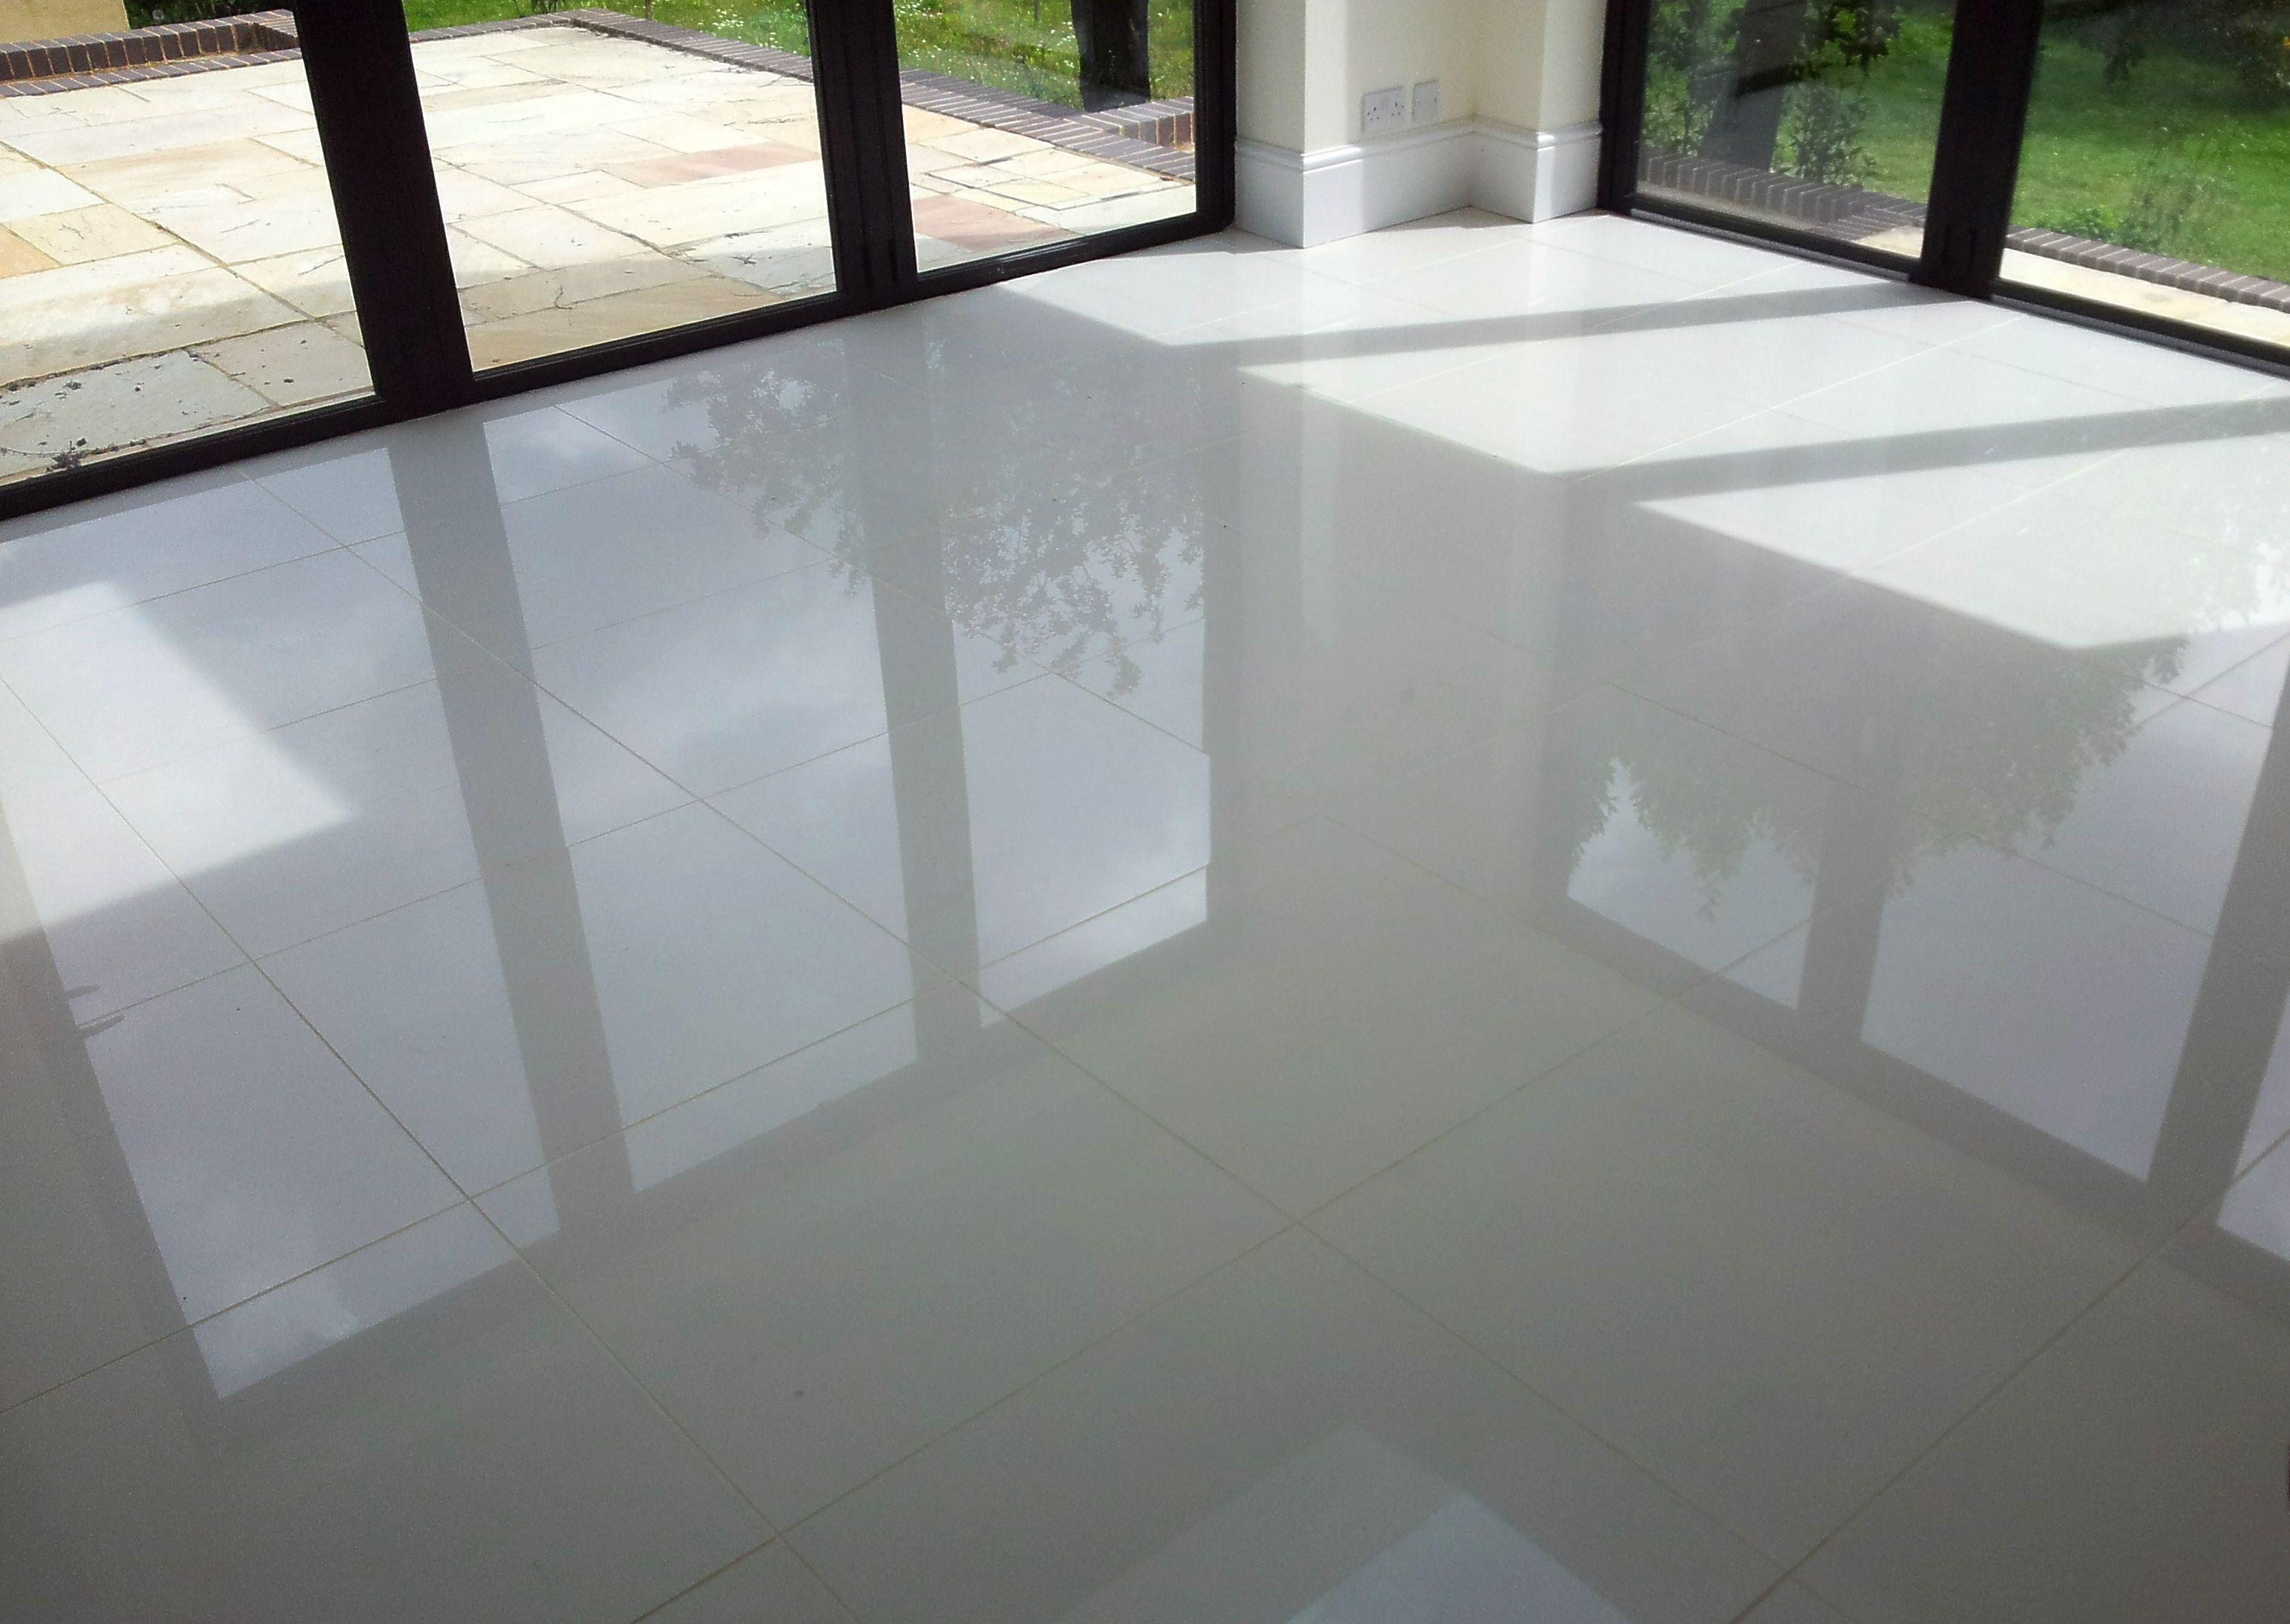 Large Grey Gloss Floor Tiles Tile floor, Large floor